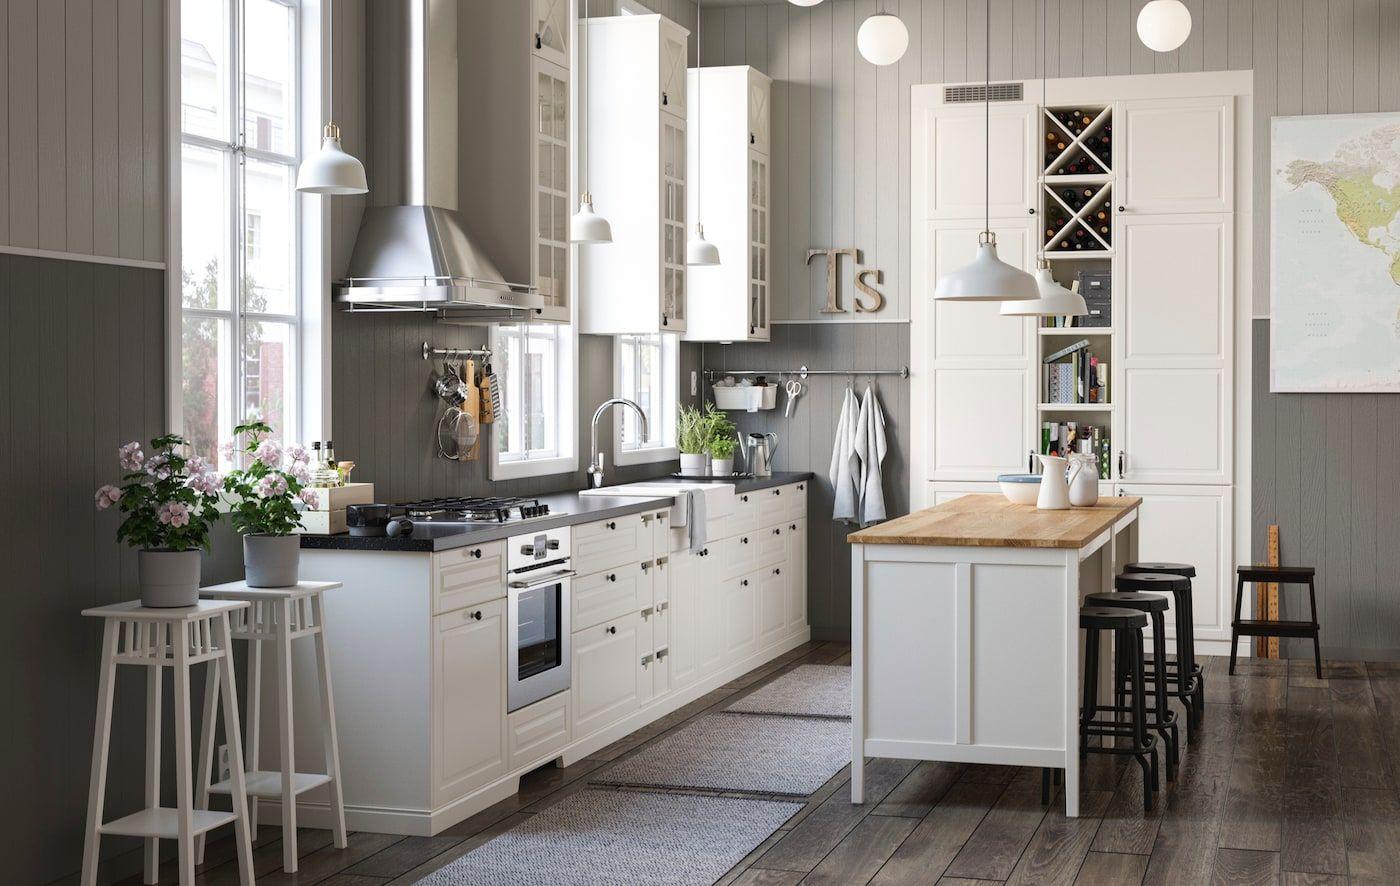 Kucheninspiration Ideen Tipps Tricks Ikea Kuche Landhaus Haus Kuchen Ikea Kuche